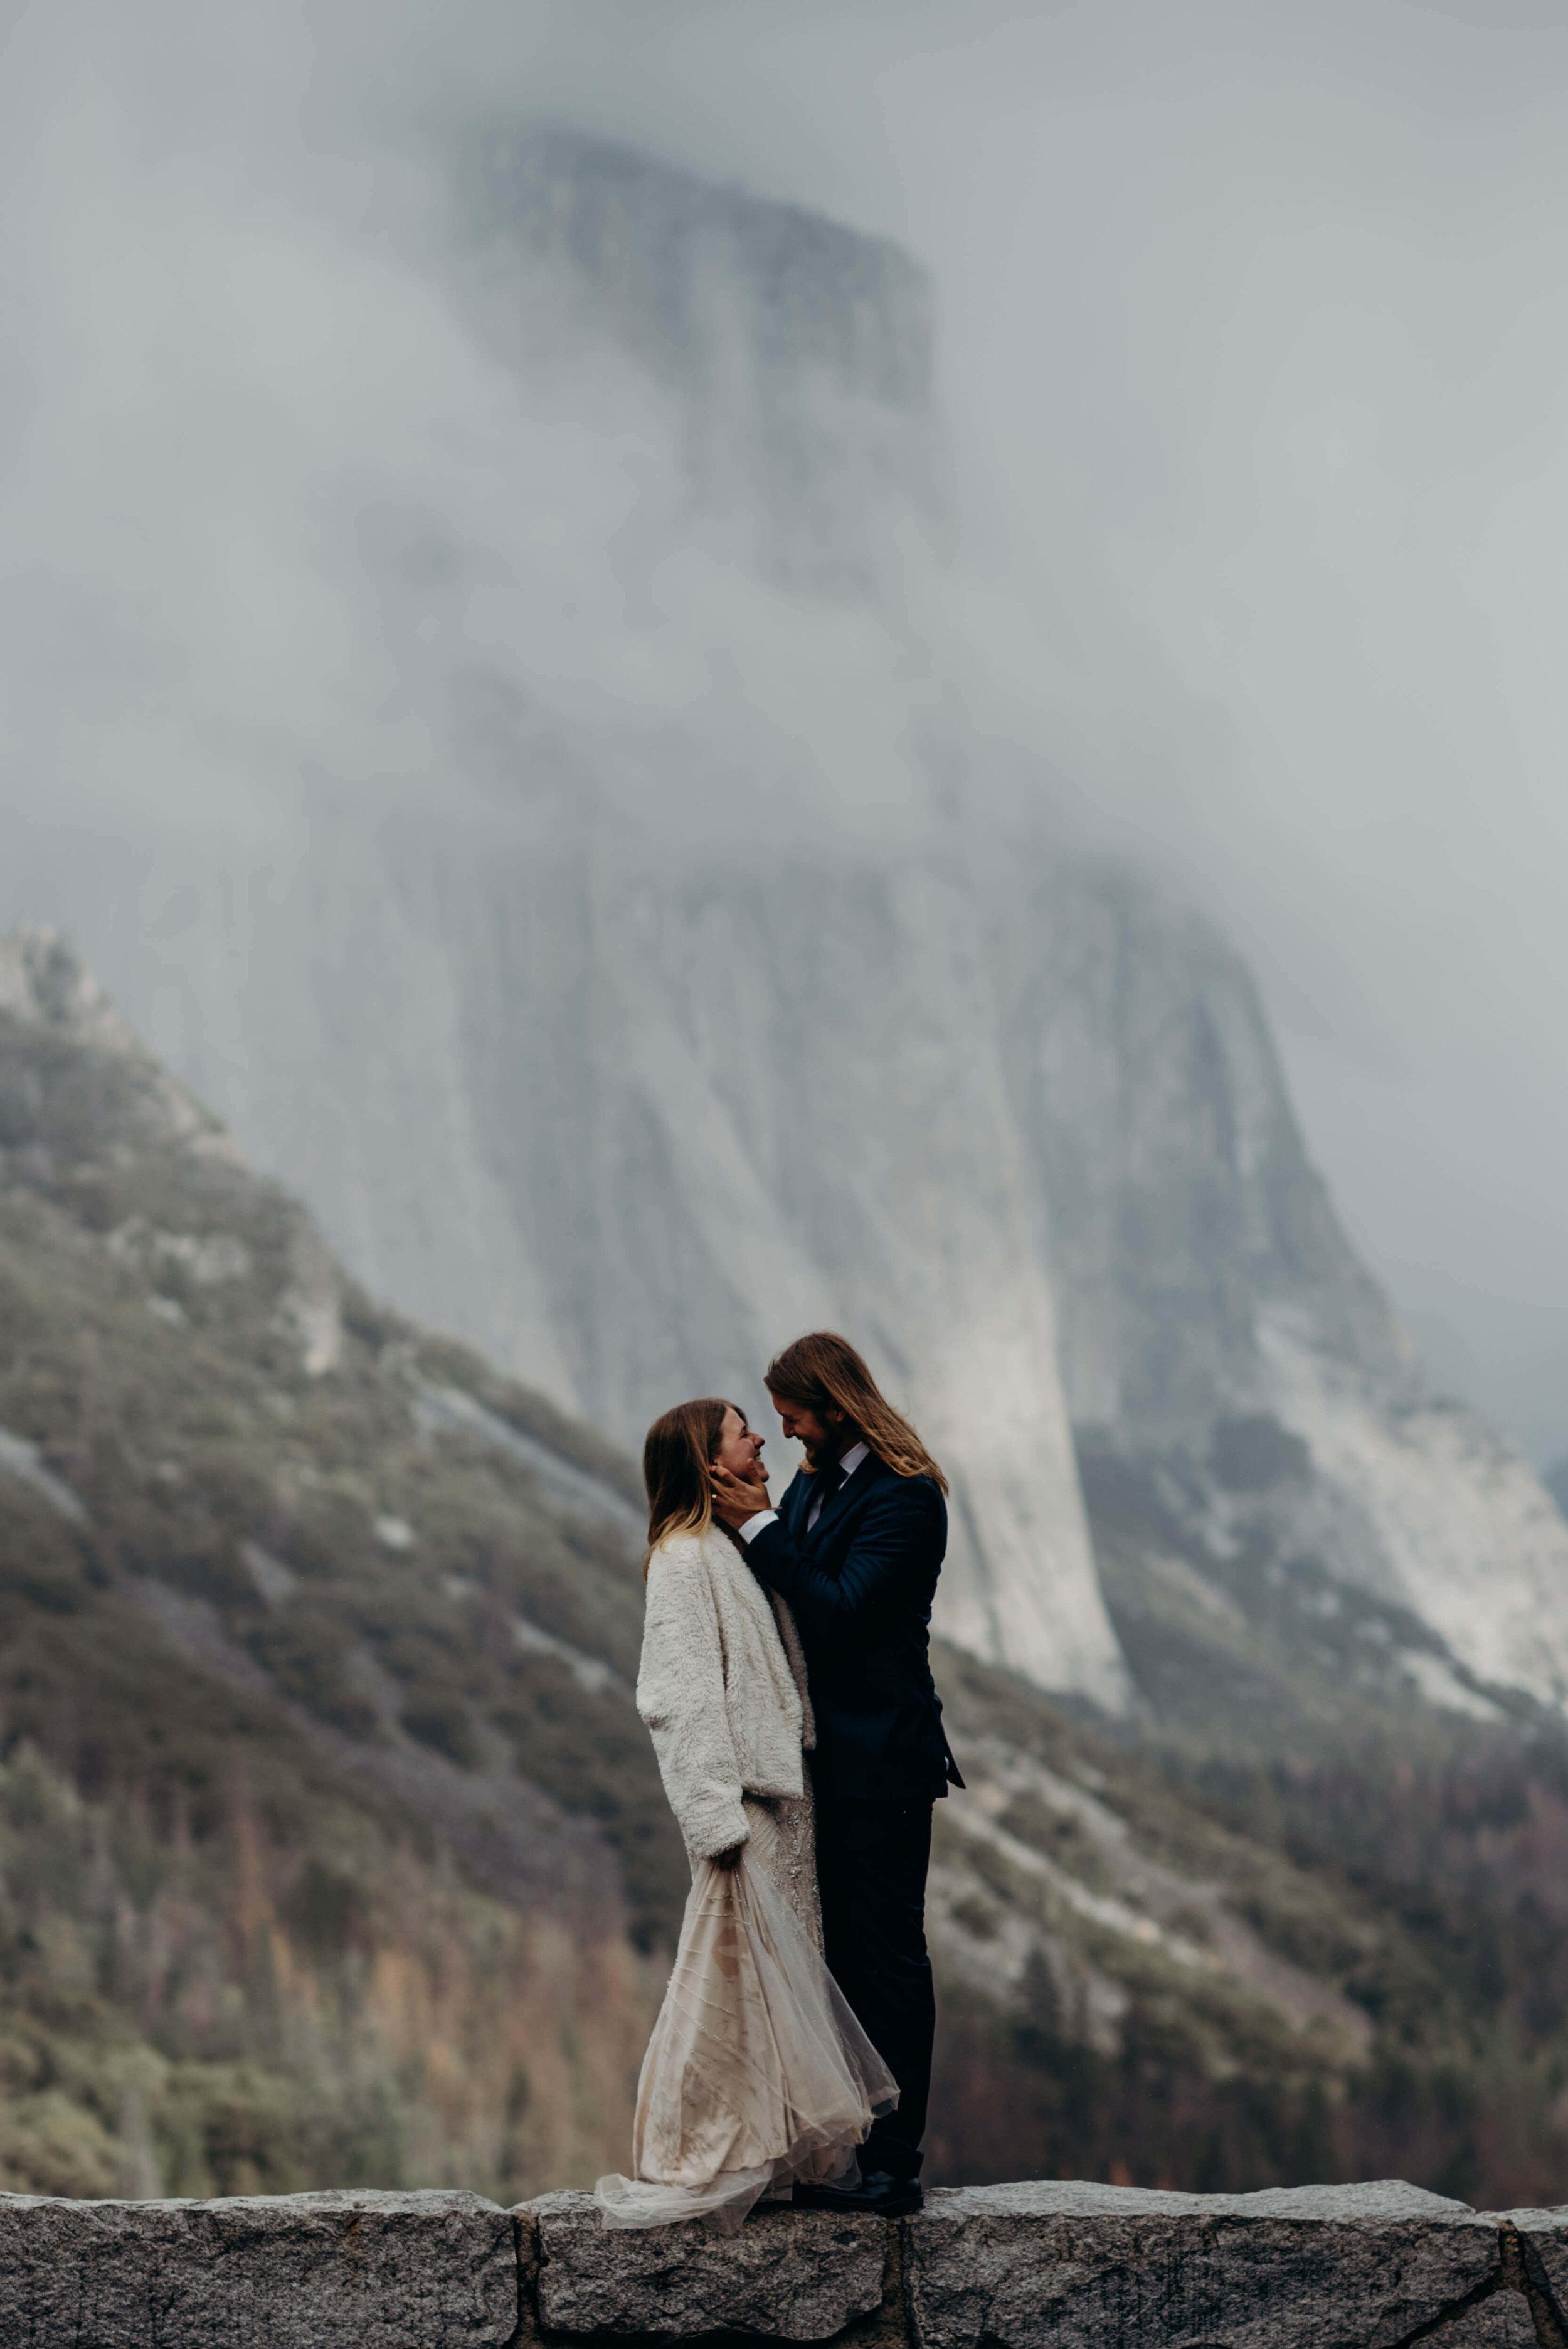 Adventure-Elopement-Yosemite-Tunnelview-5.jpg